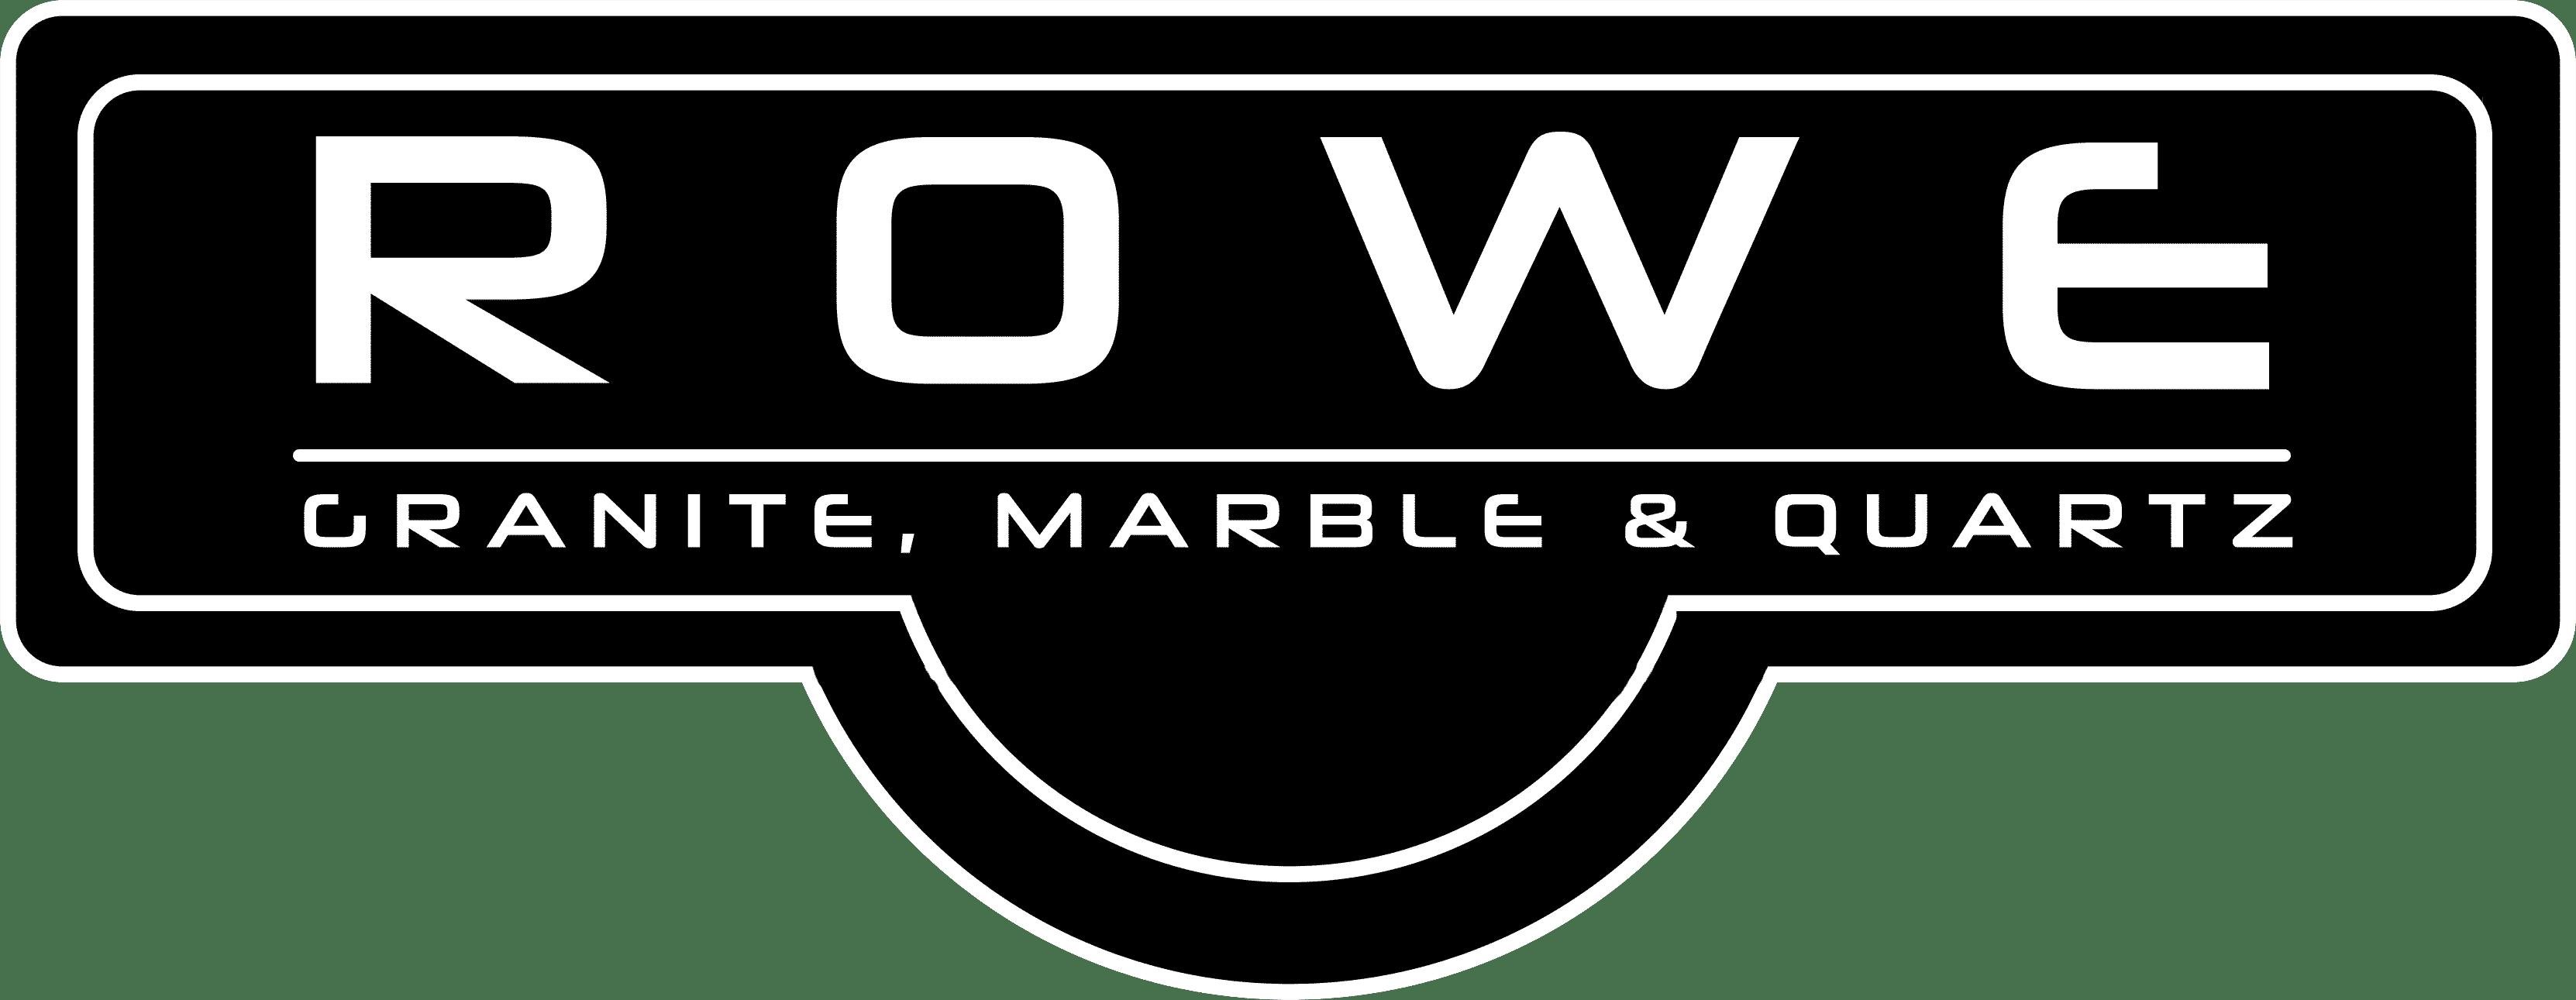 Rowe Granite